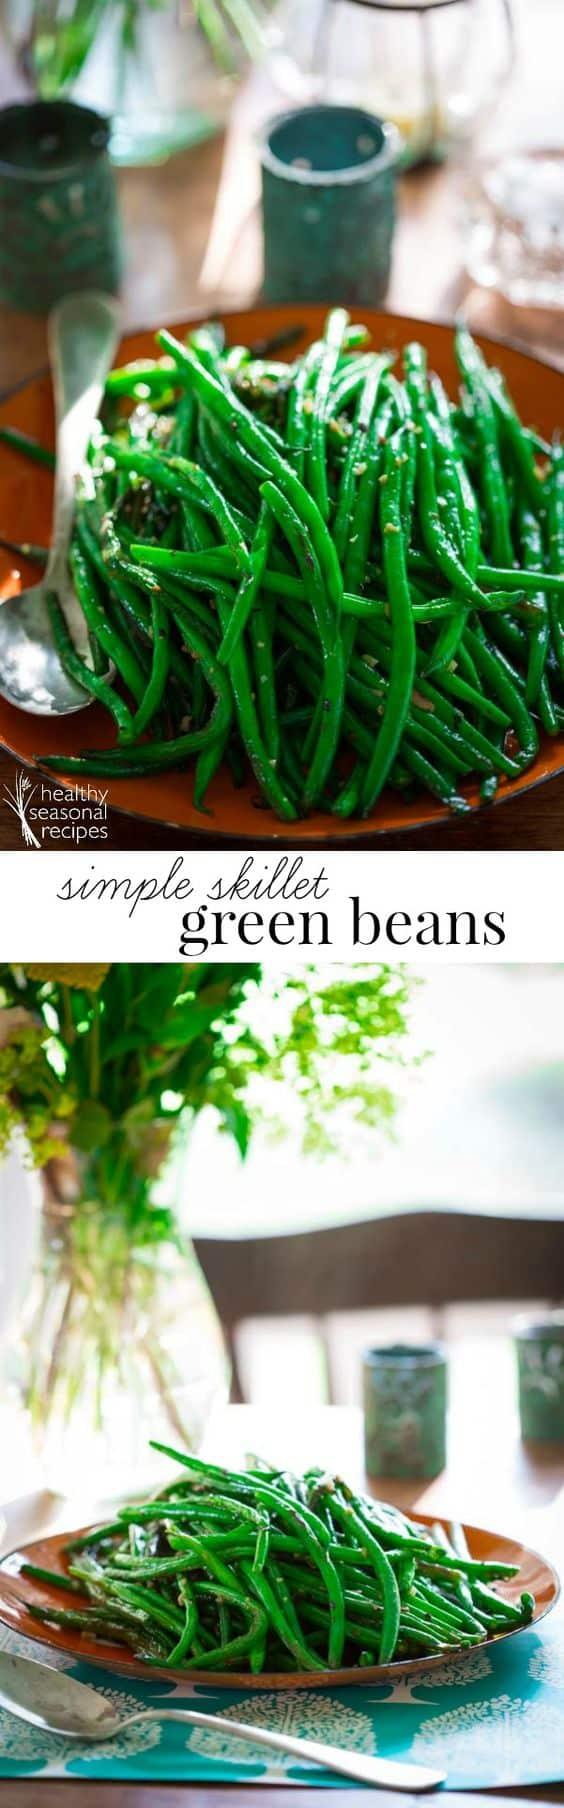 Keto Simple Skillet Green Beans